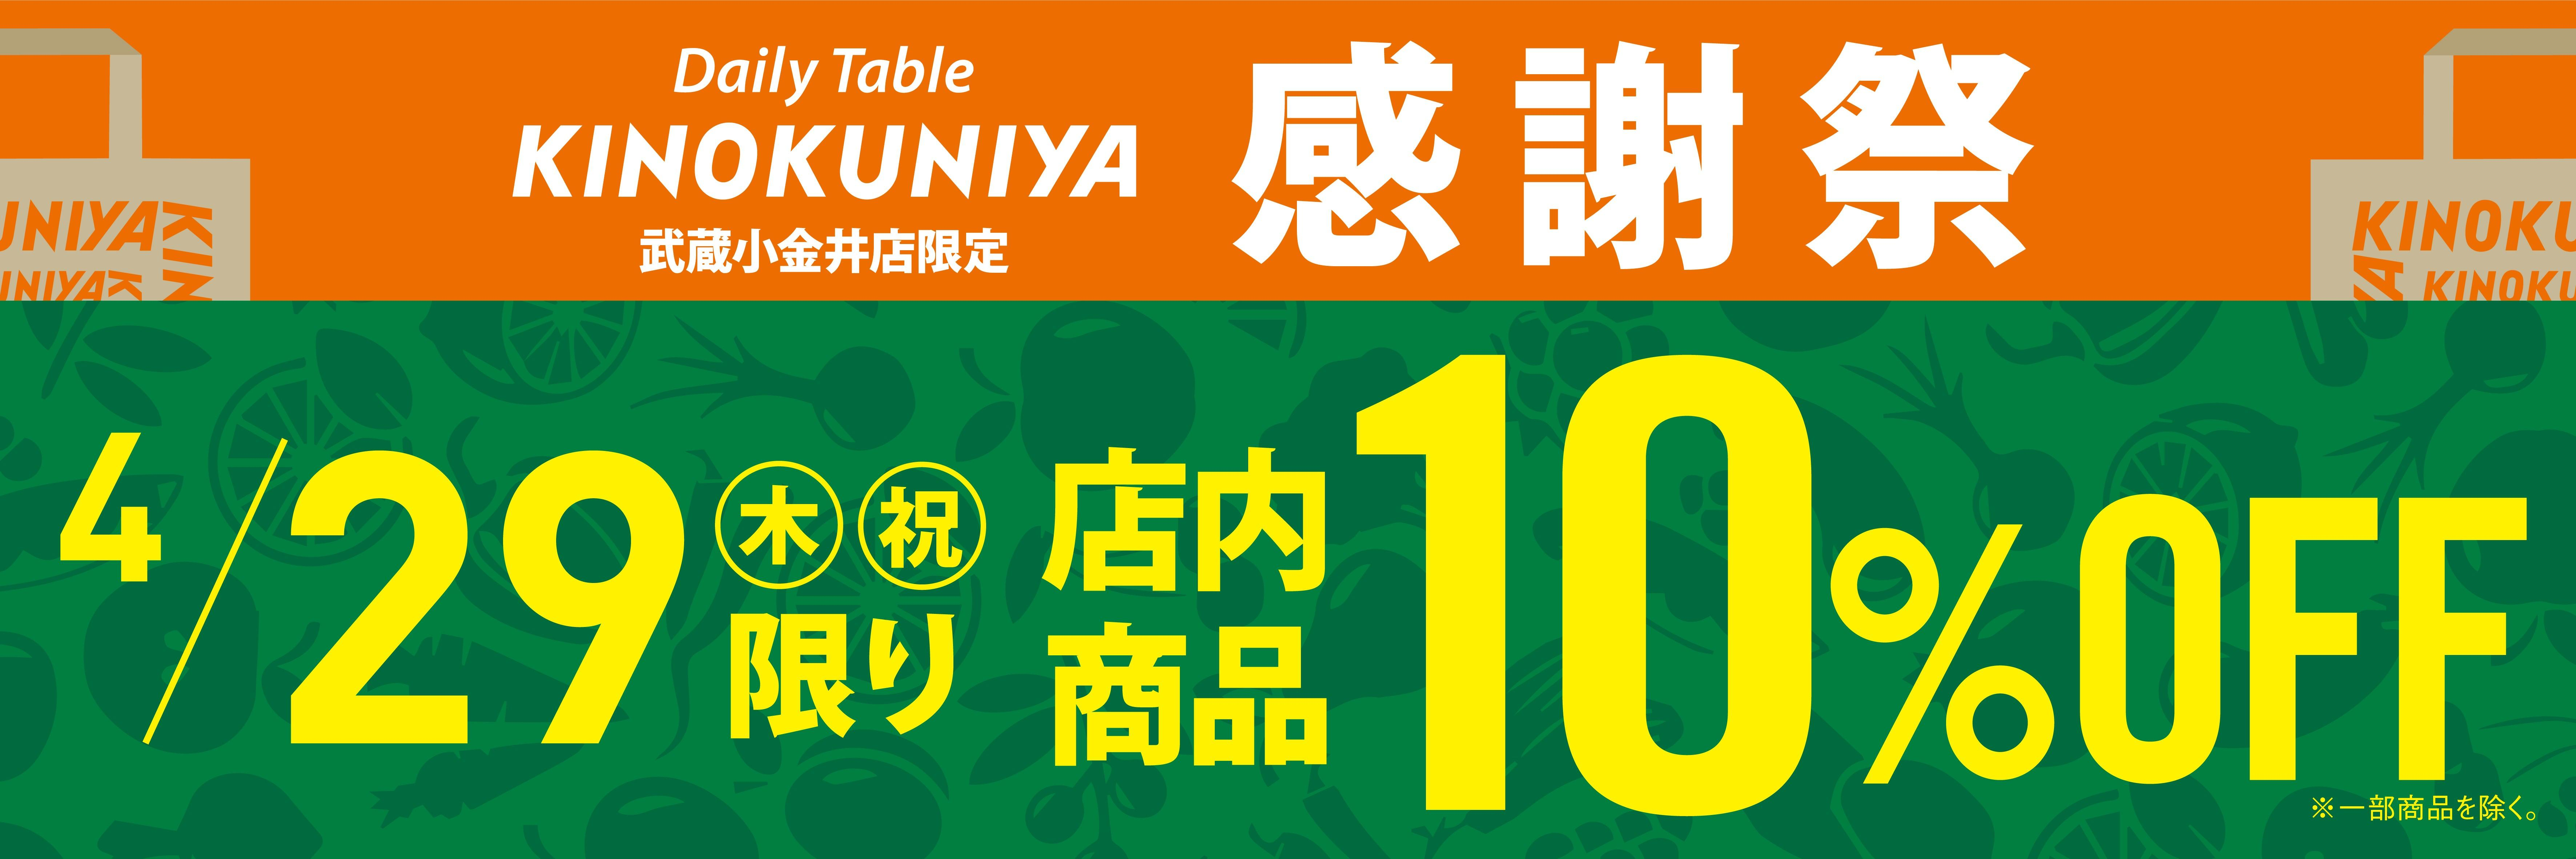 SOCOLA 武蔵小金井クロス店限定 感謝祭のお知らせ(4/29限り 10%OFF)